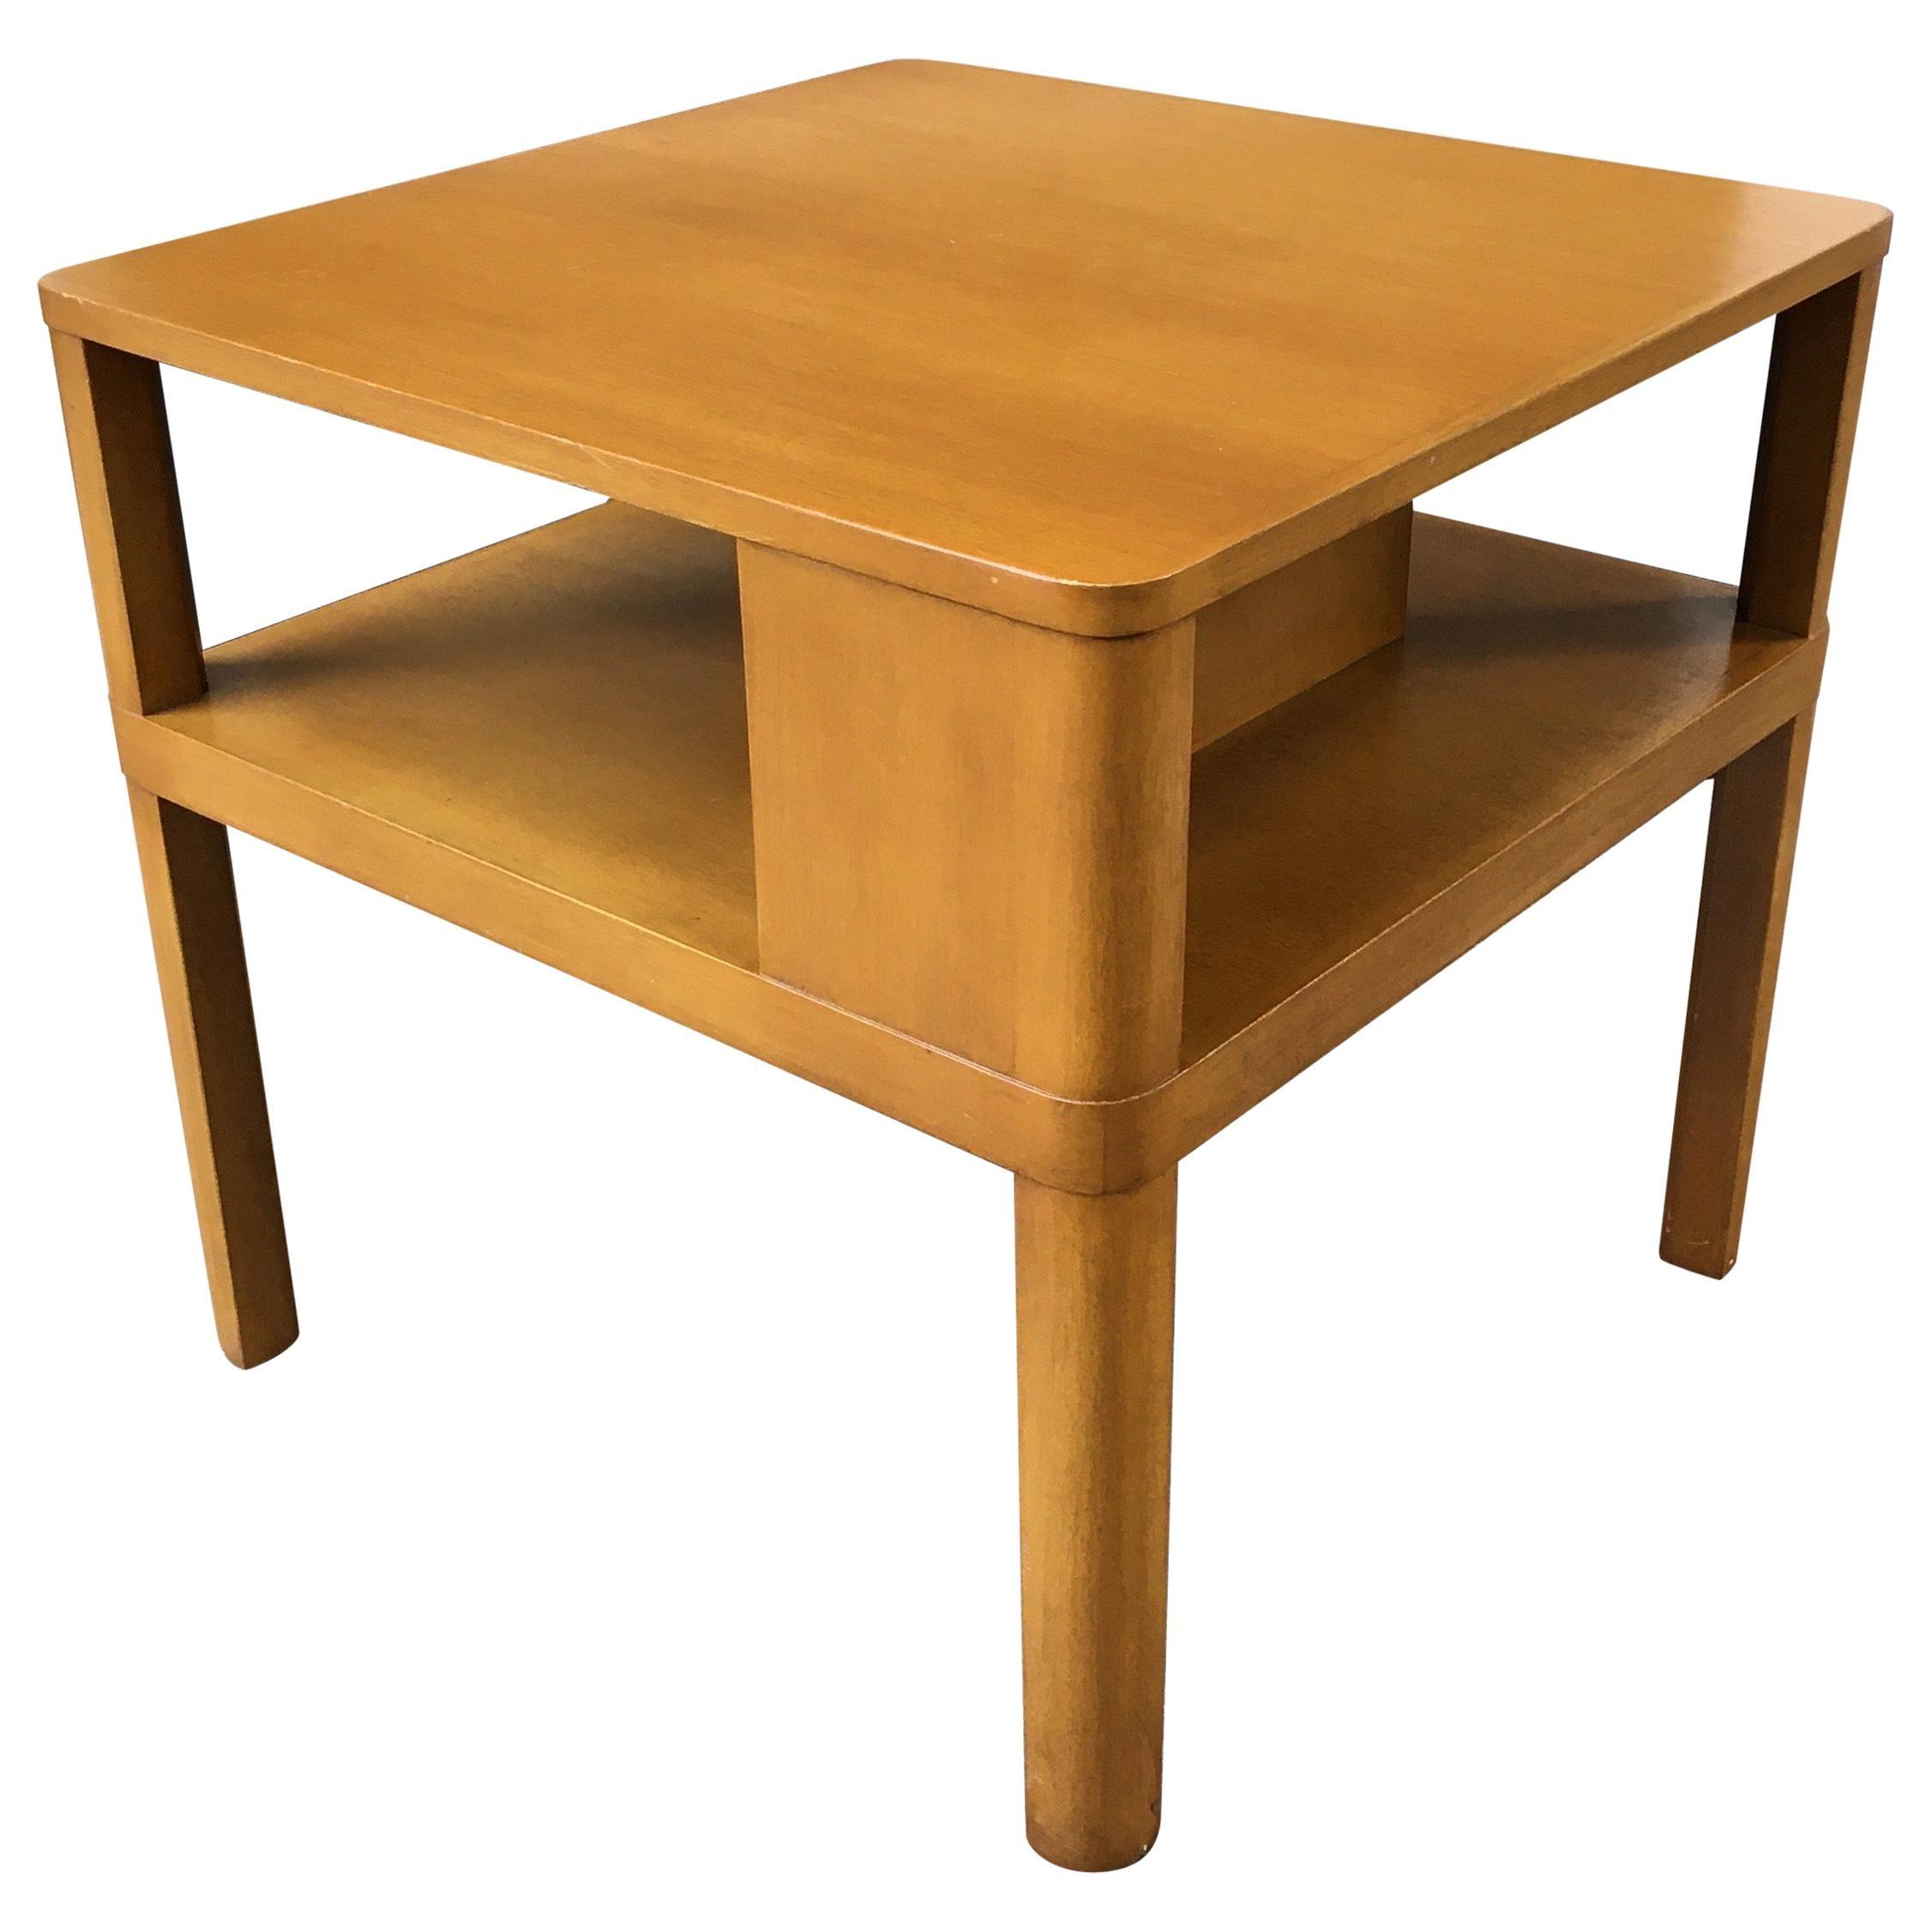 Edward Wormley for Dunbar End Table with Book Shelf